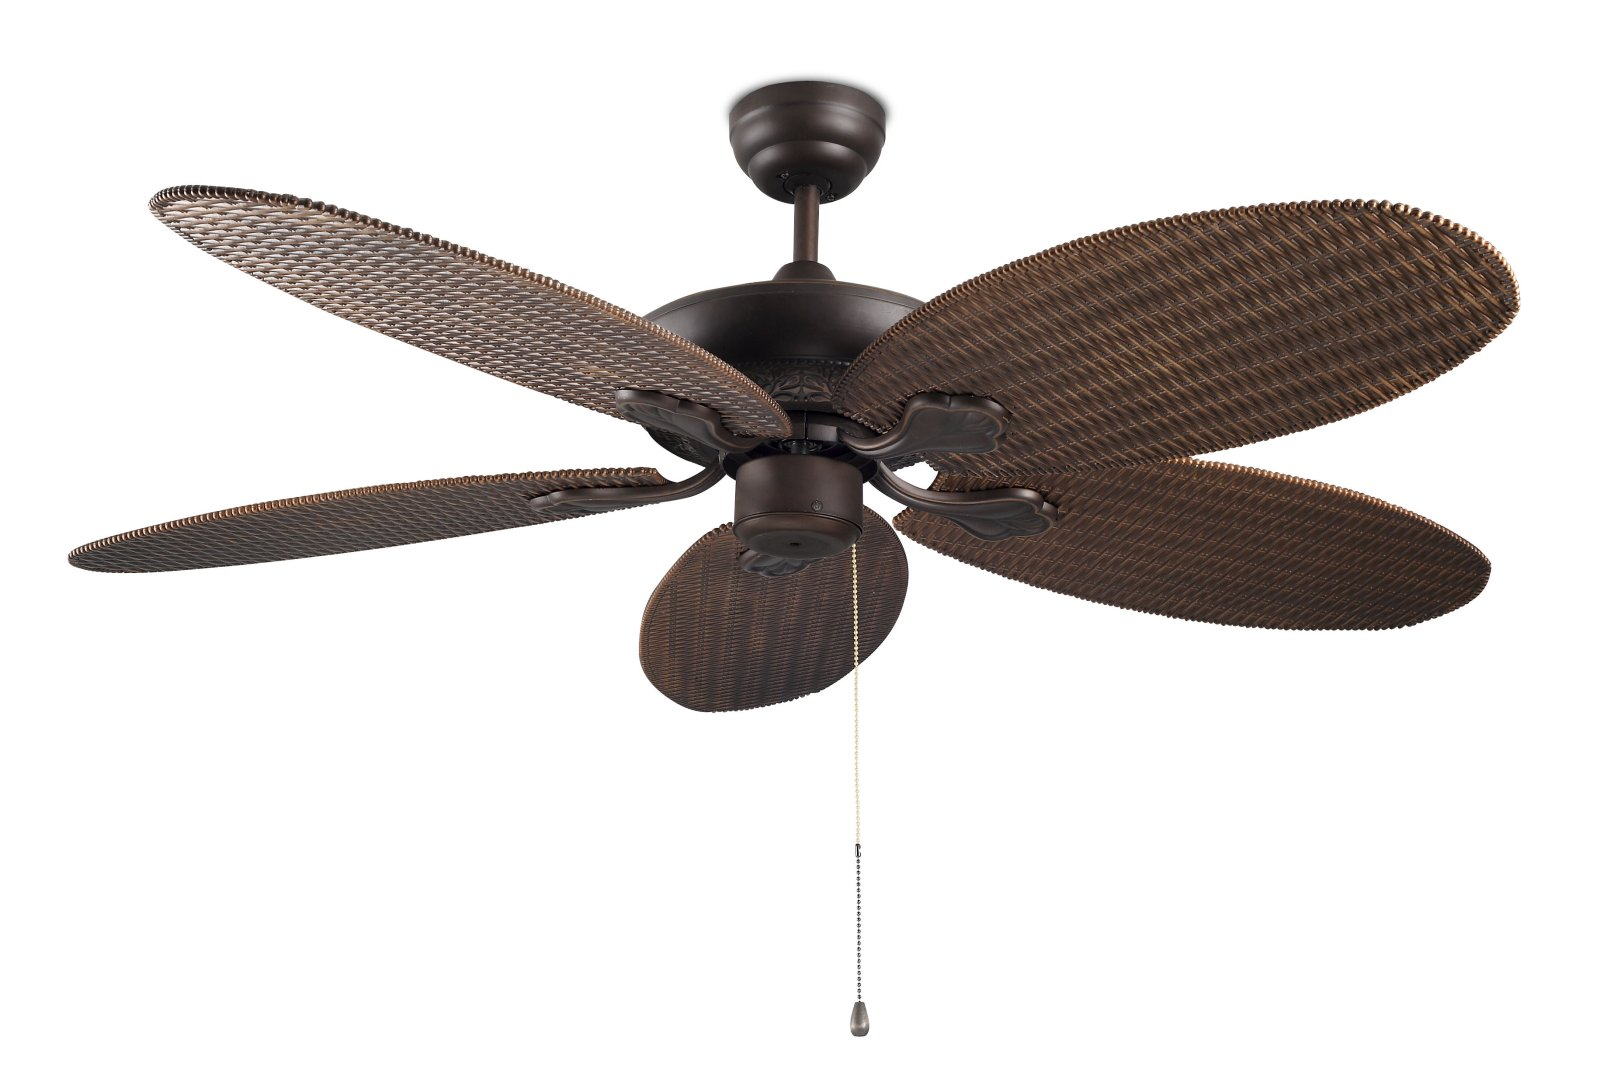 10 benefits of wicker ceiling fans | warisan lighting